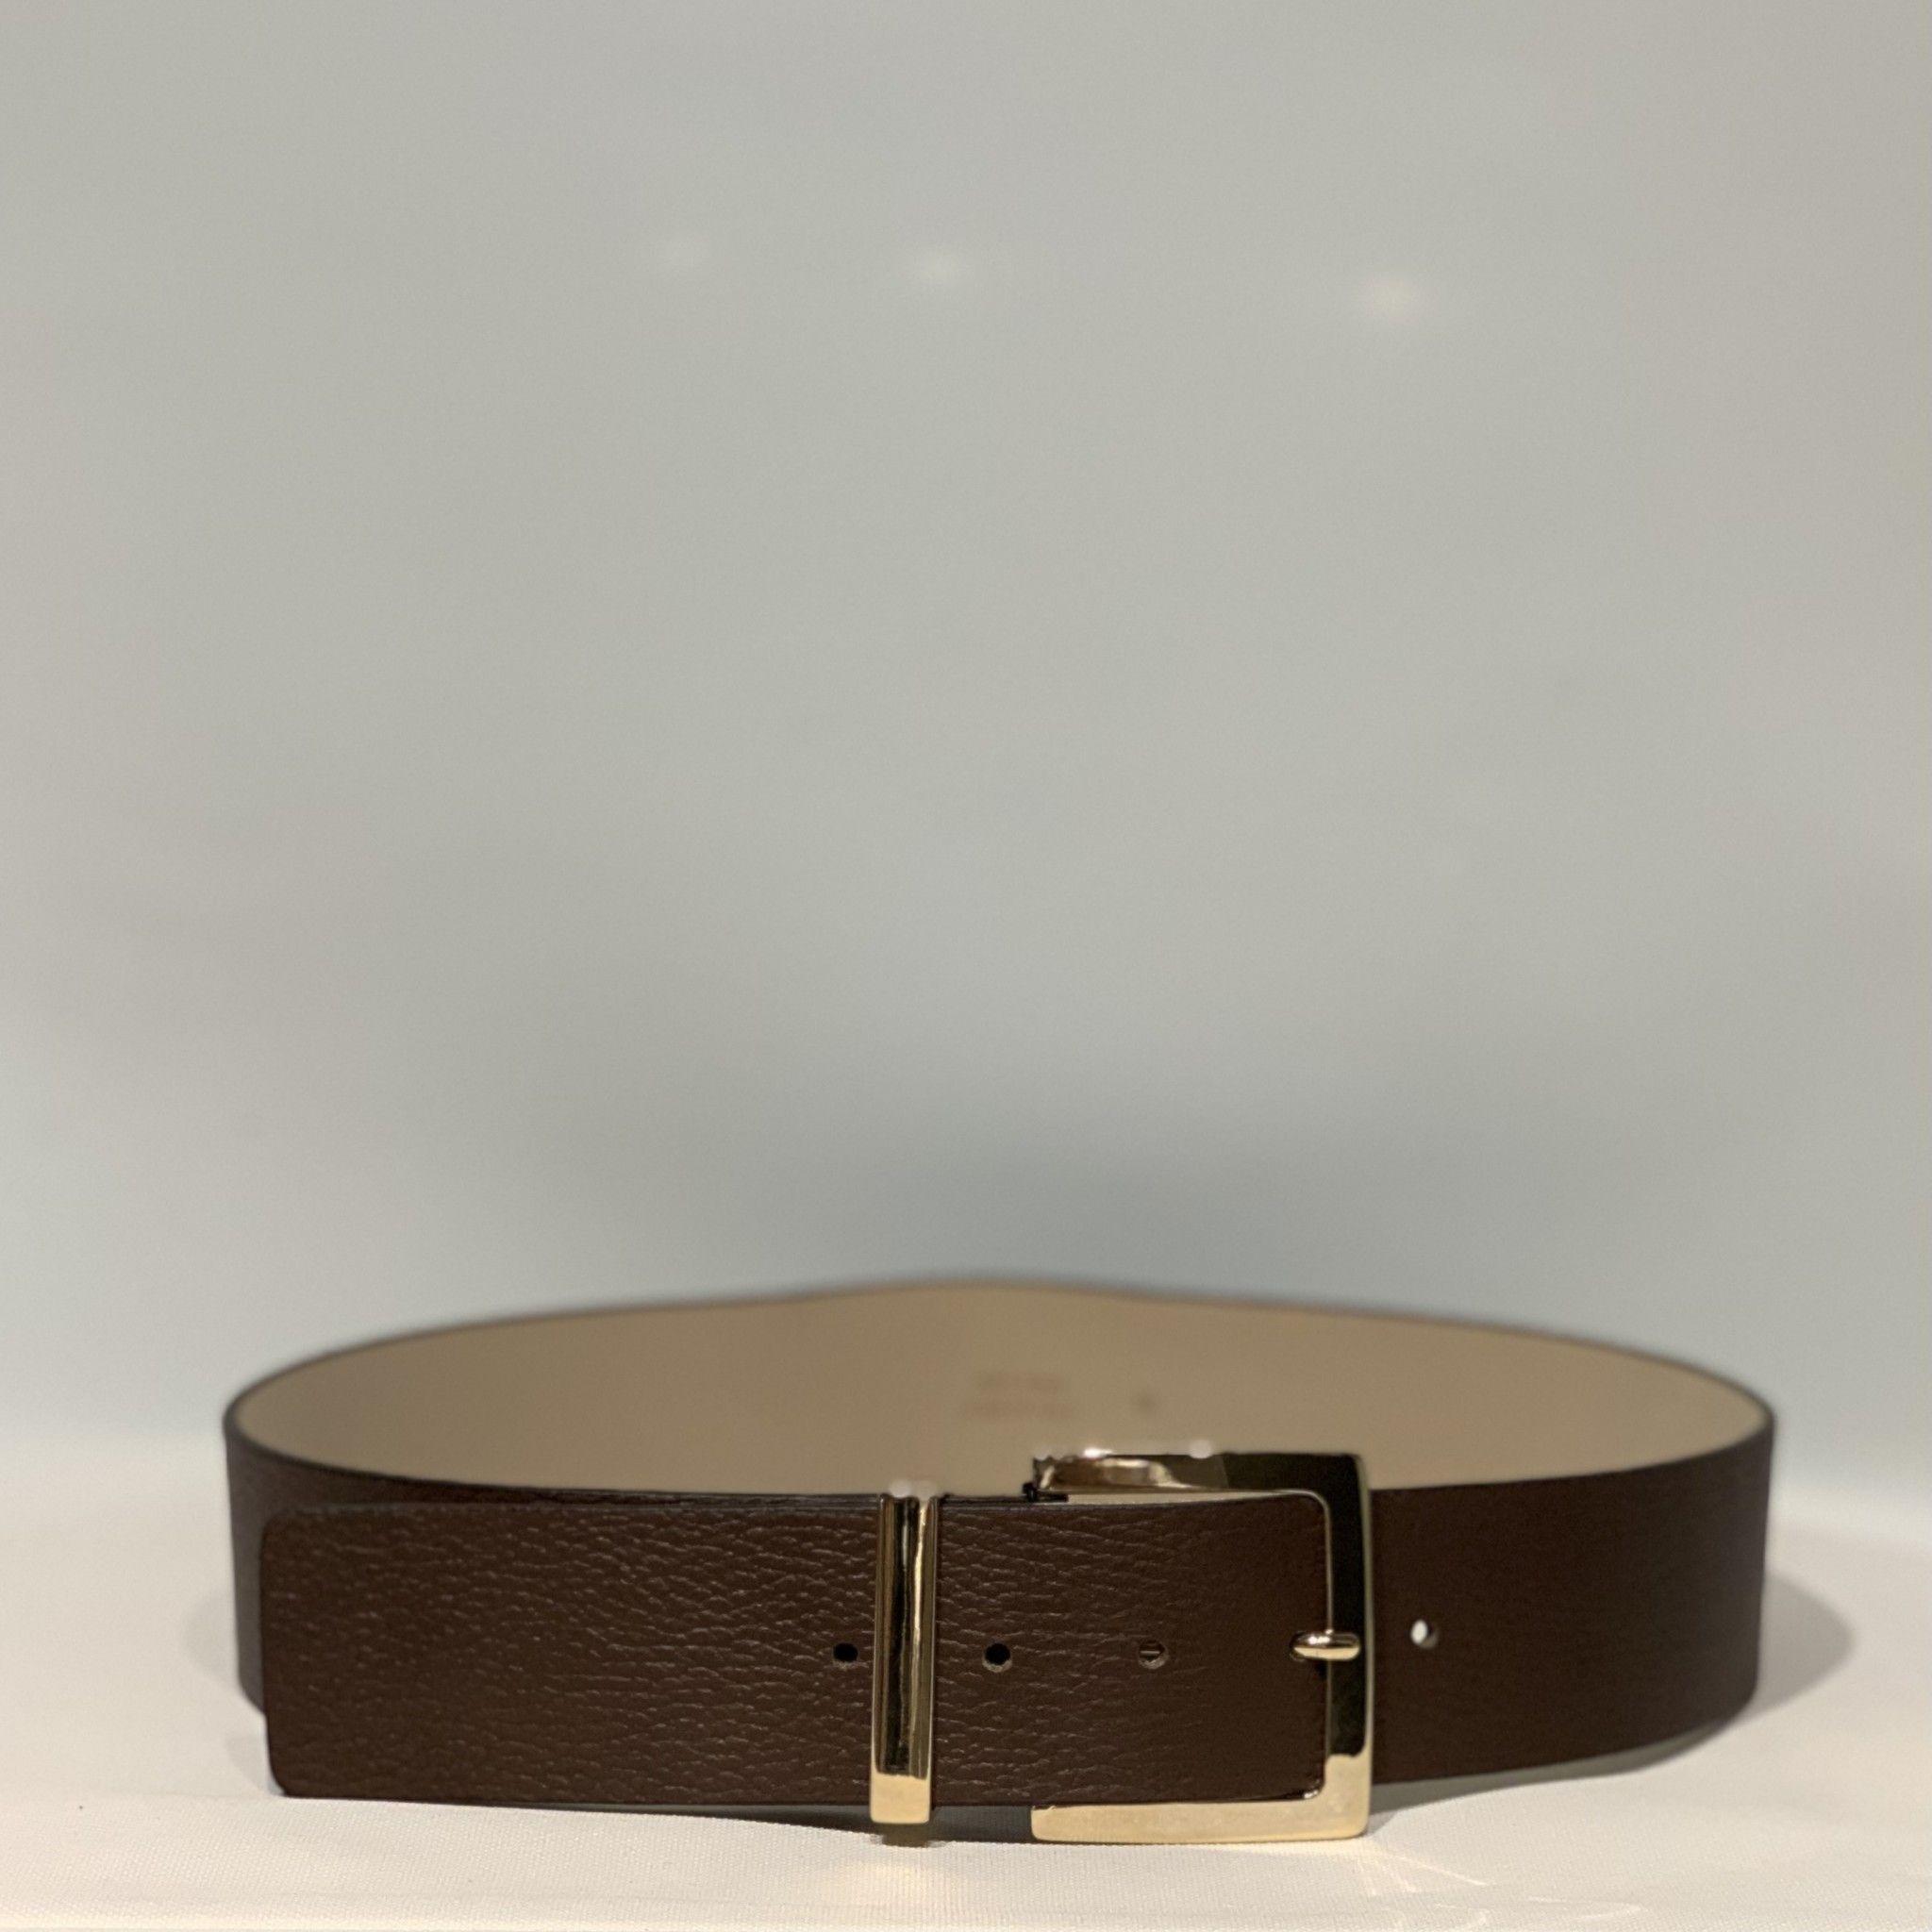 Cintura pelle marrone PELLETTERIA G4